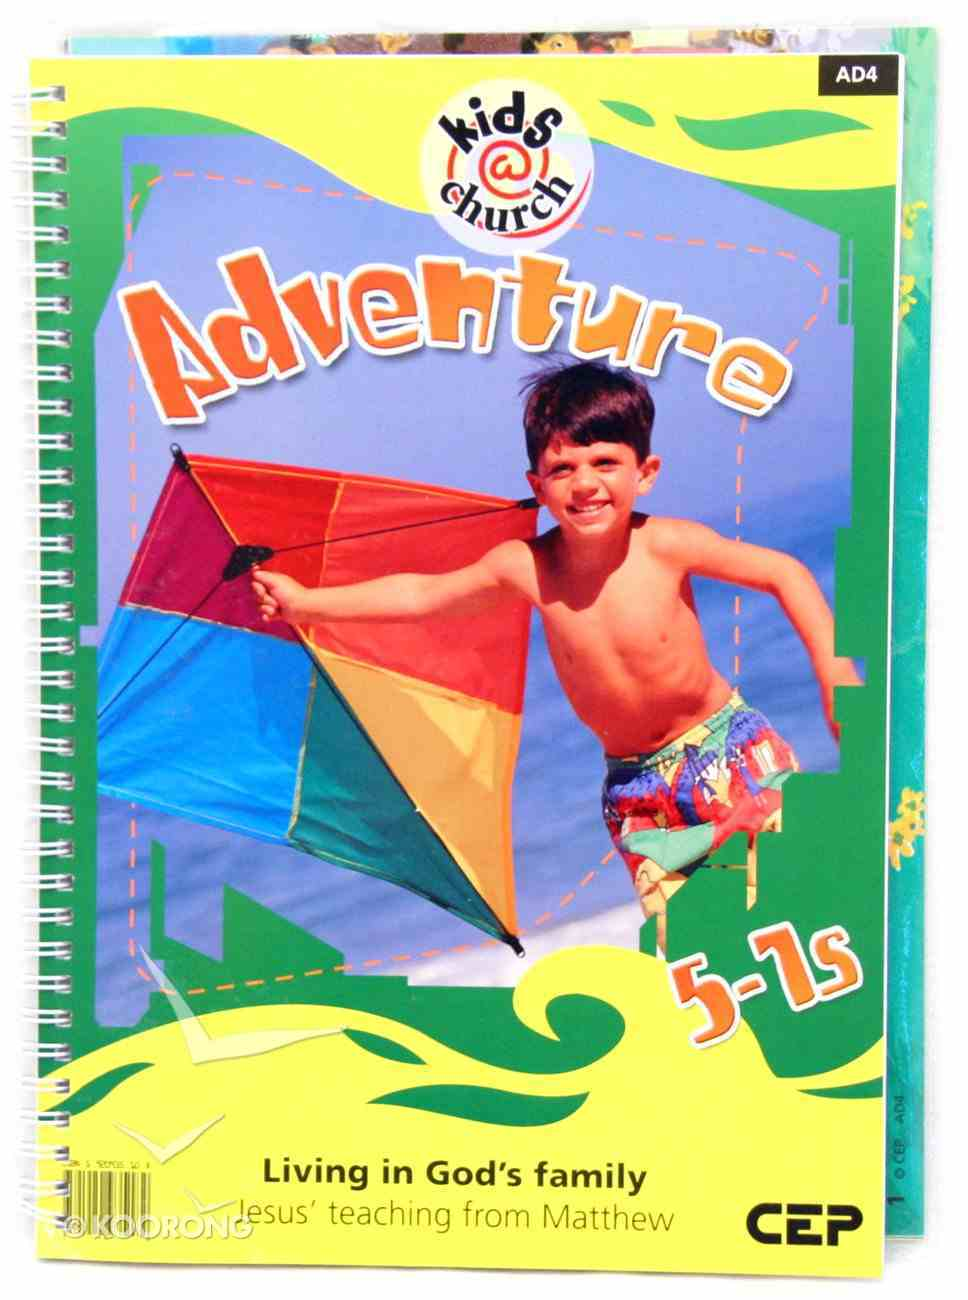 Kids@Church 04: Ad4 Ages 5-7 Teacher's Manual (Adventure) (Kids@church Curriculum Series) Spiral